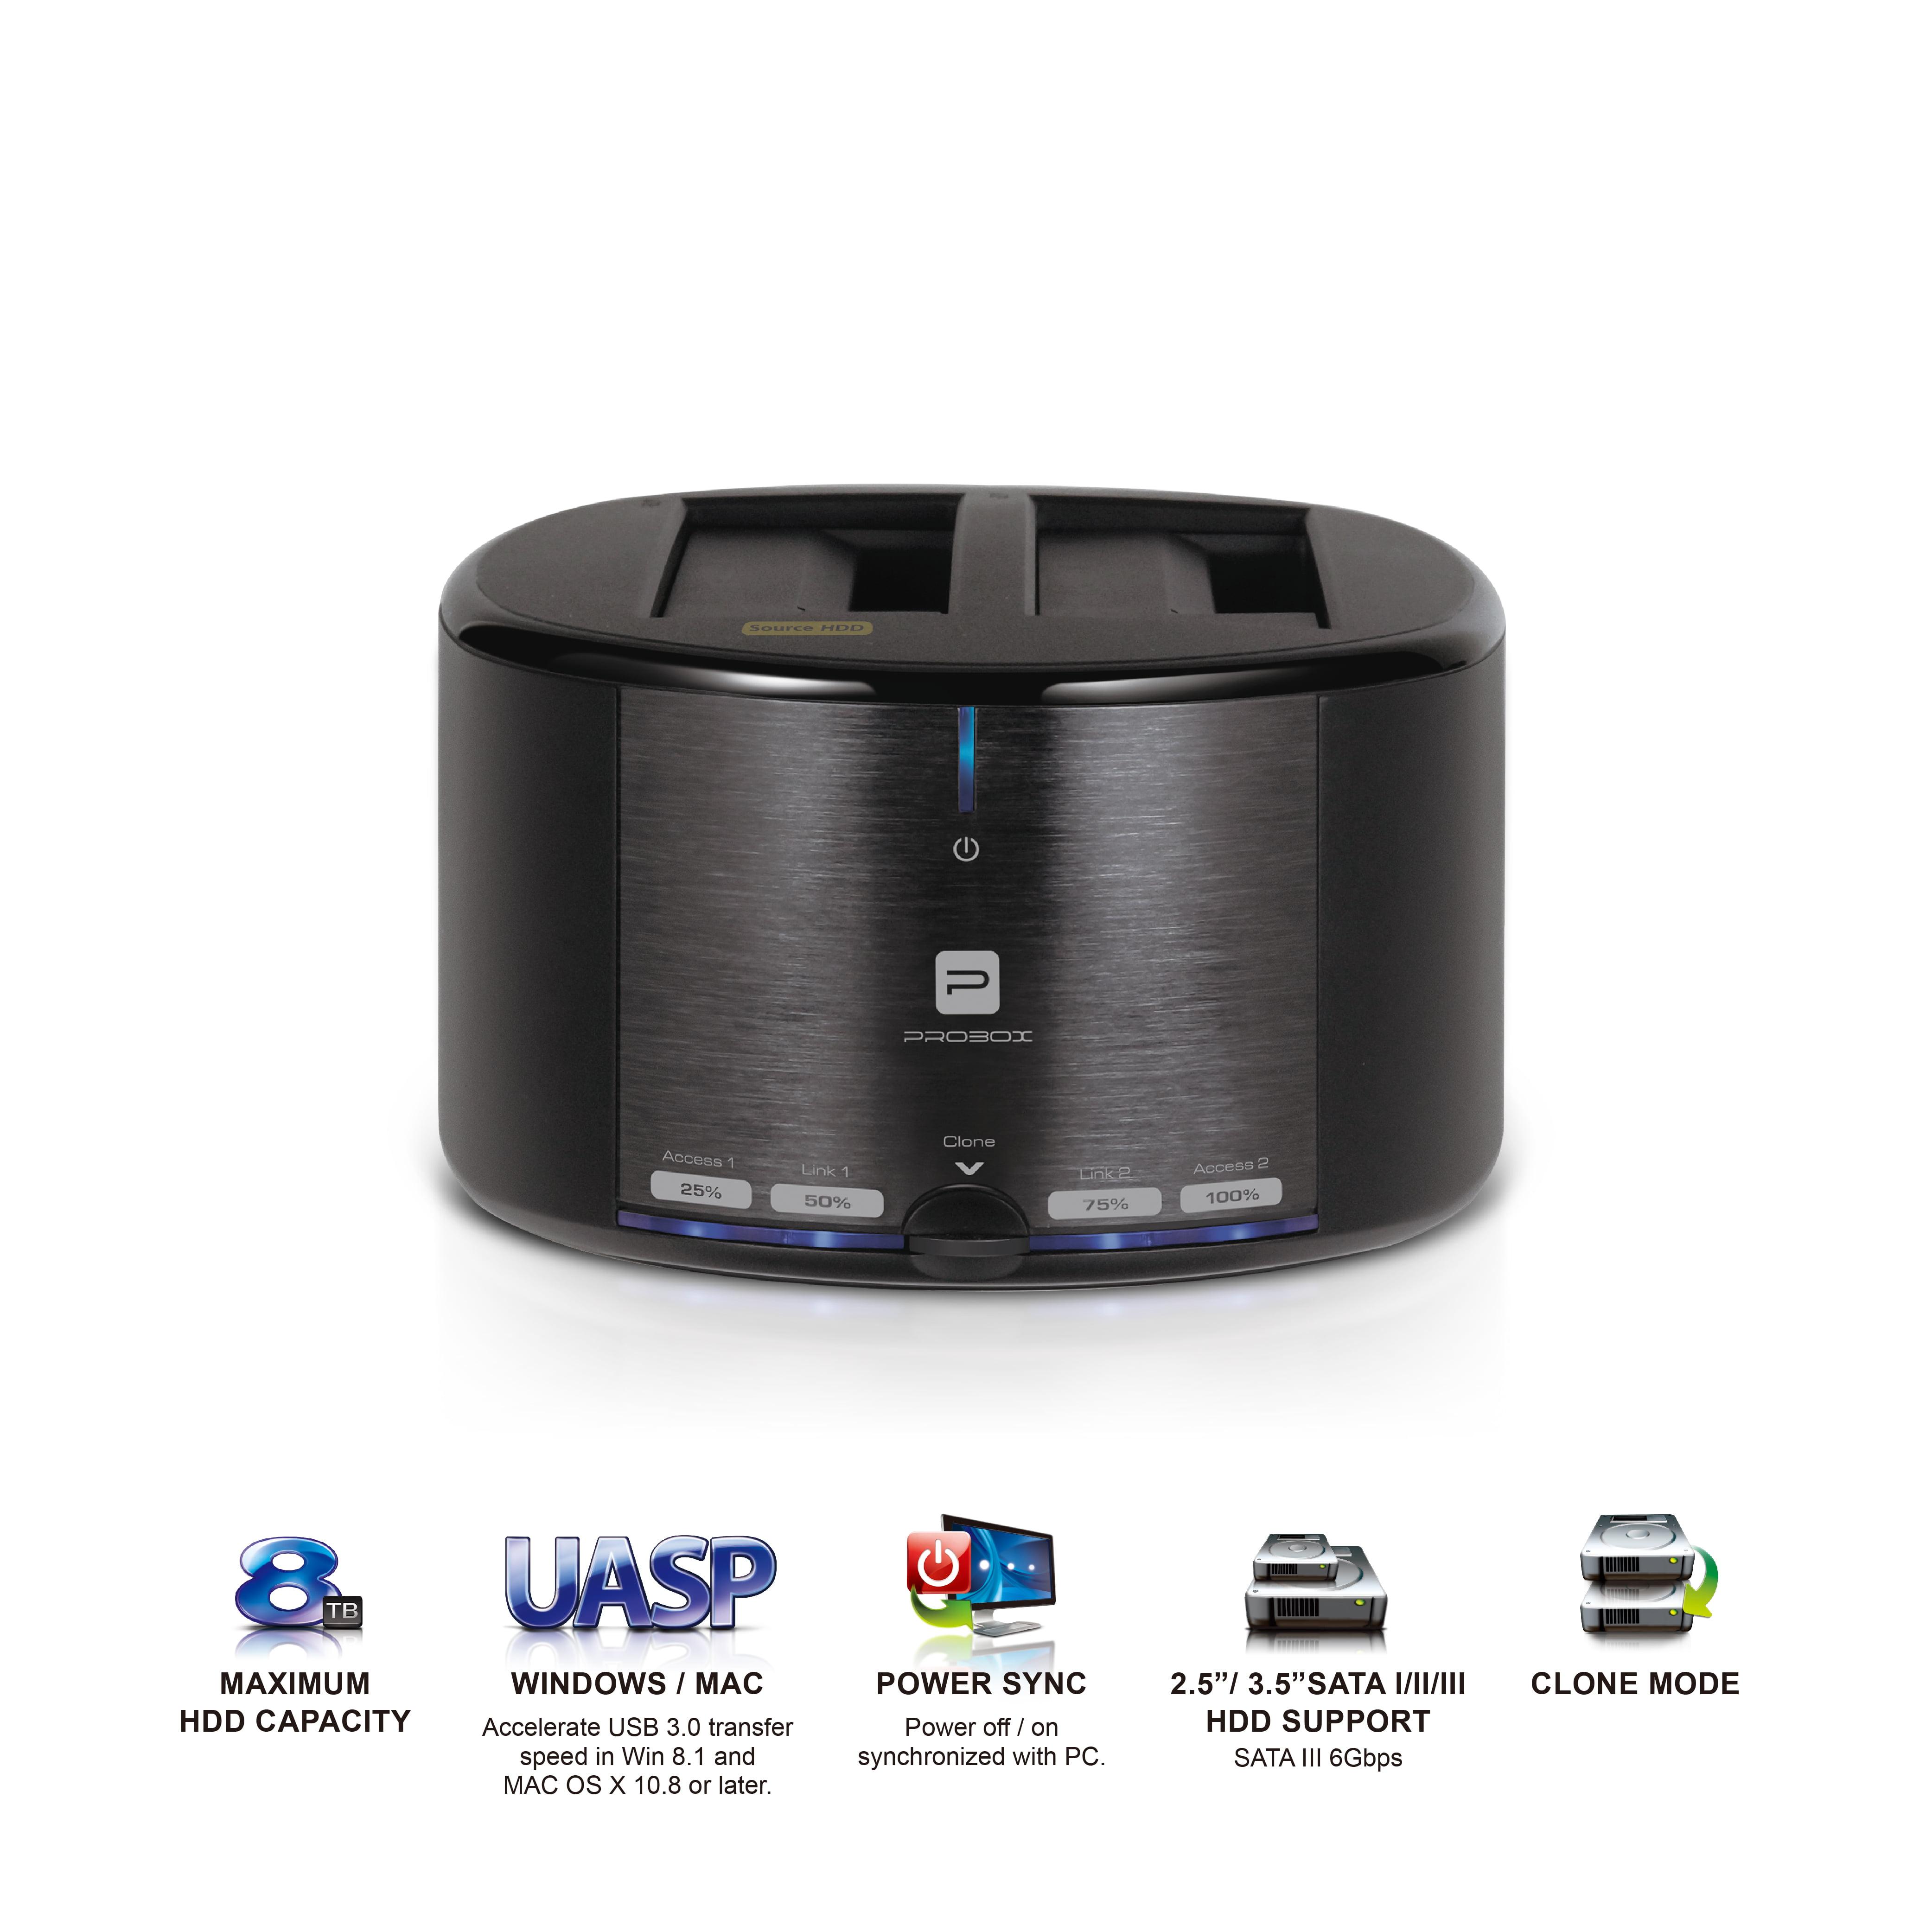 Mediasonic ProBox HUD1-SU3 USB 3.0 2 Bay External Hard Drive Docking Station for